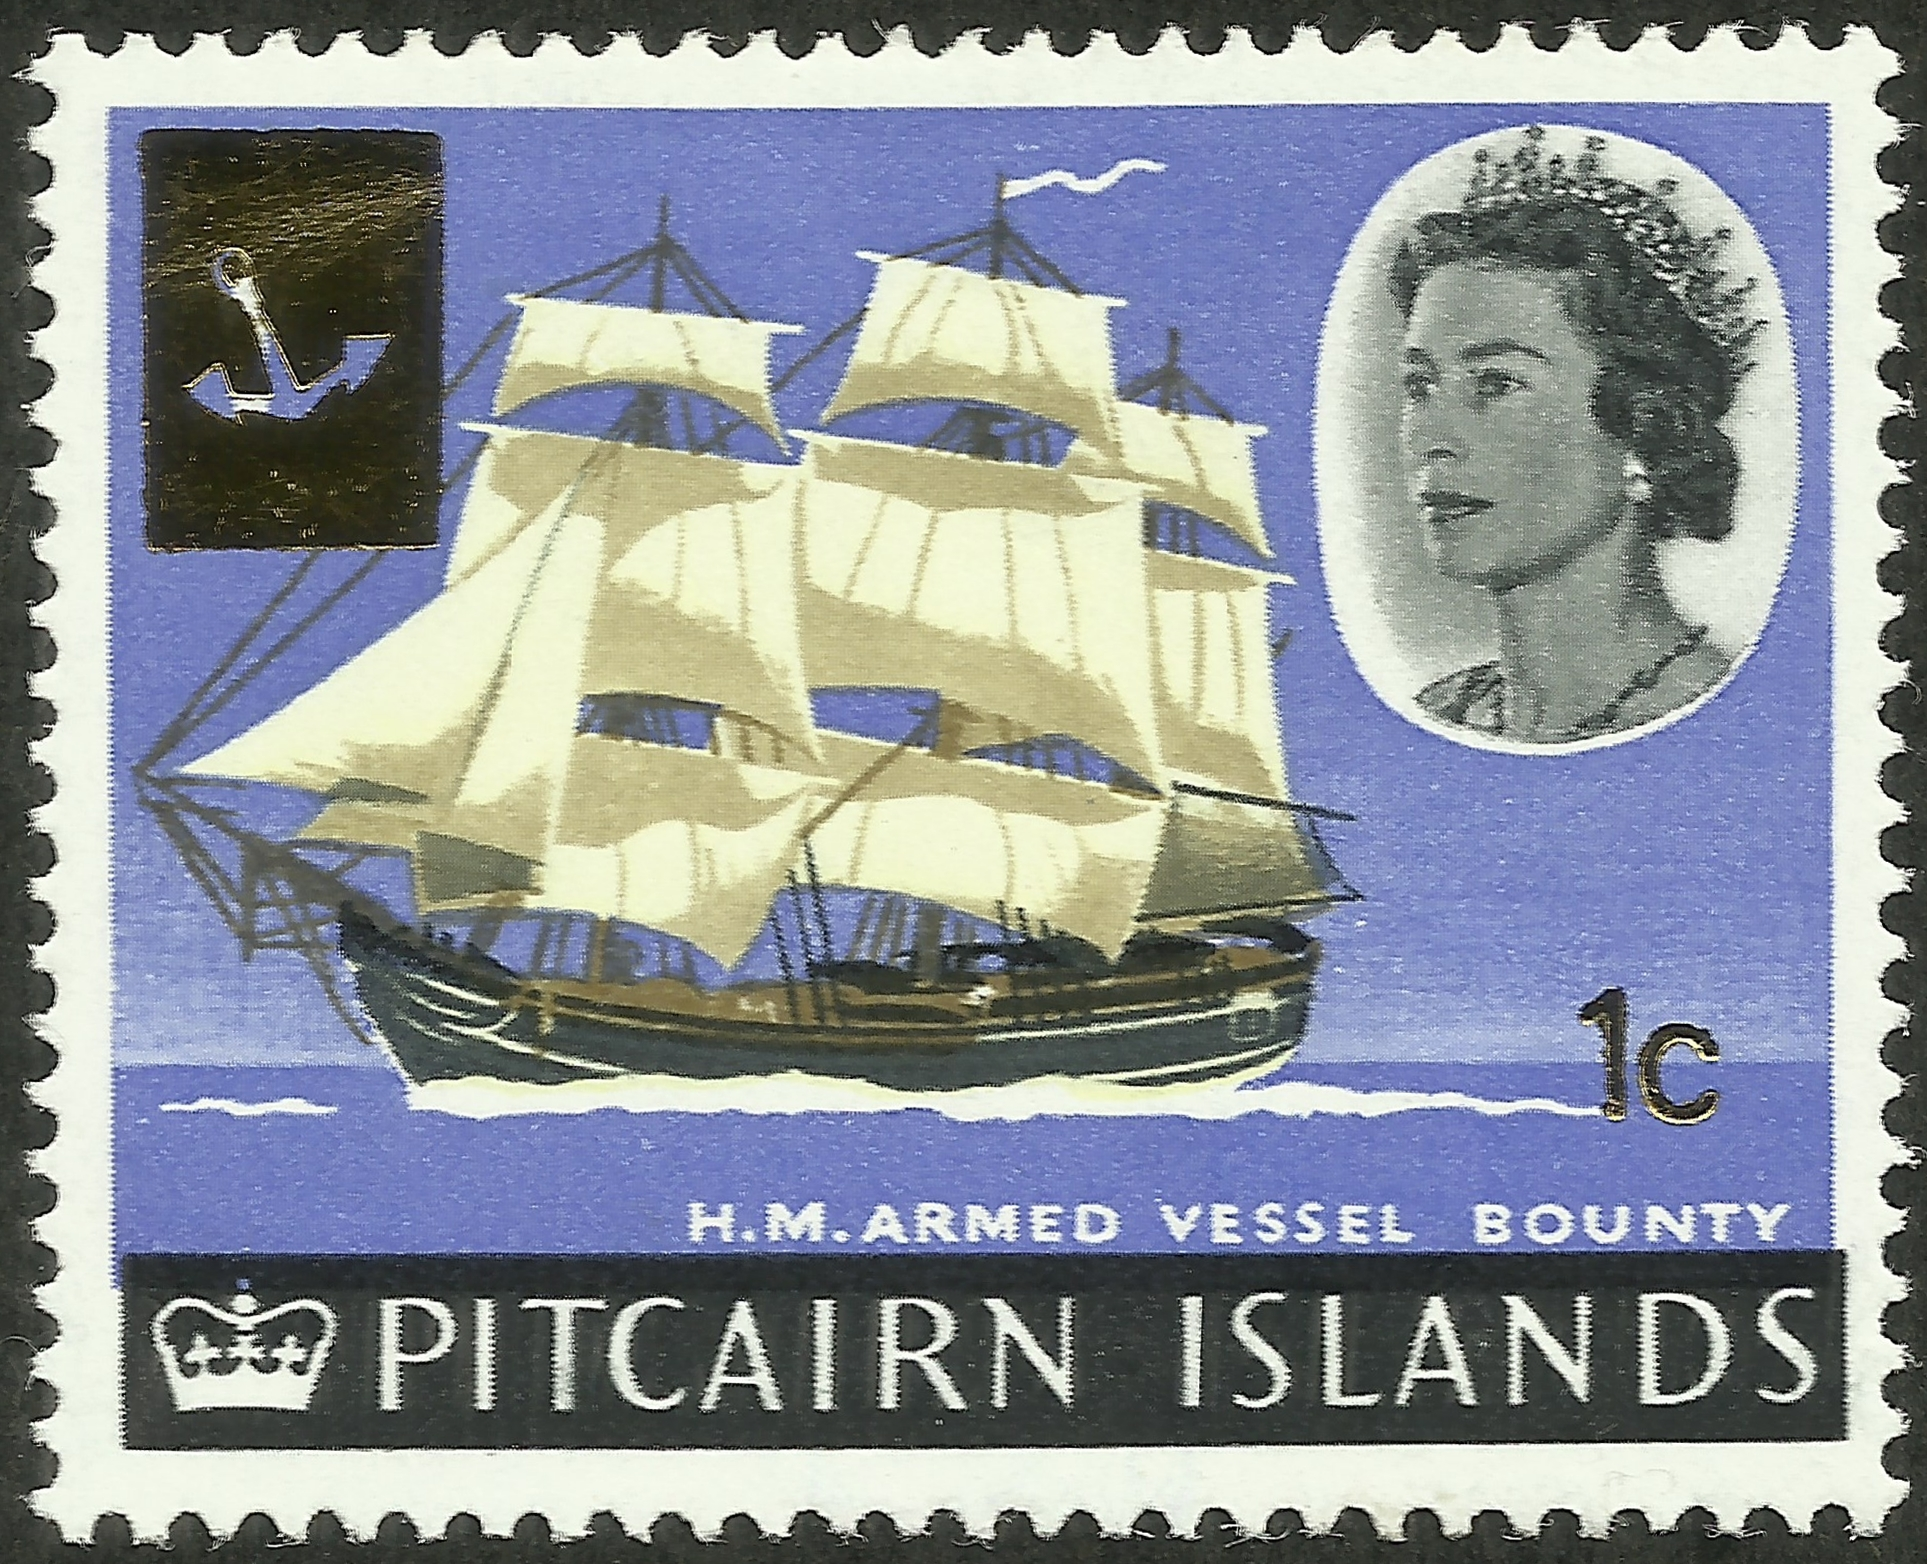 Pitcairn Islands - Scott #73 (1967). HMAV Bounty